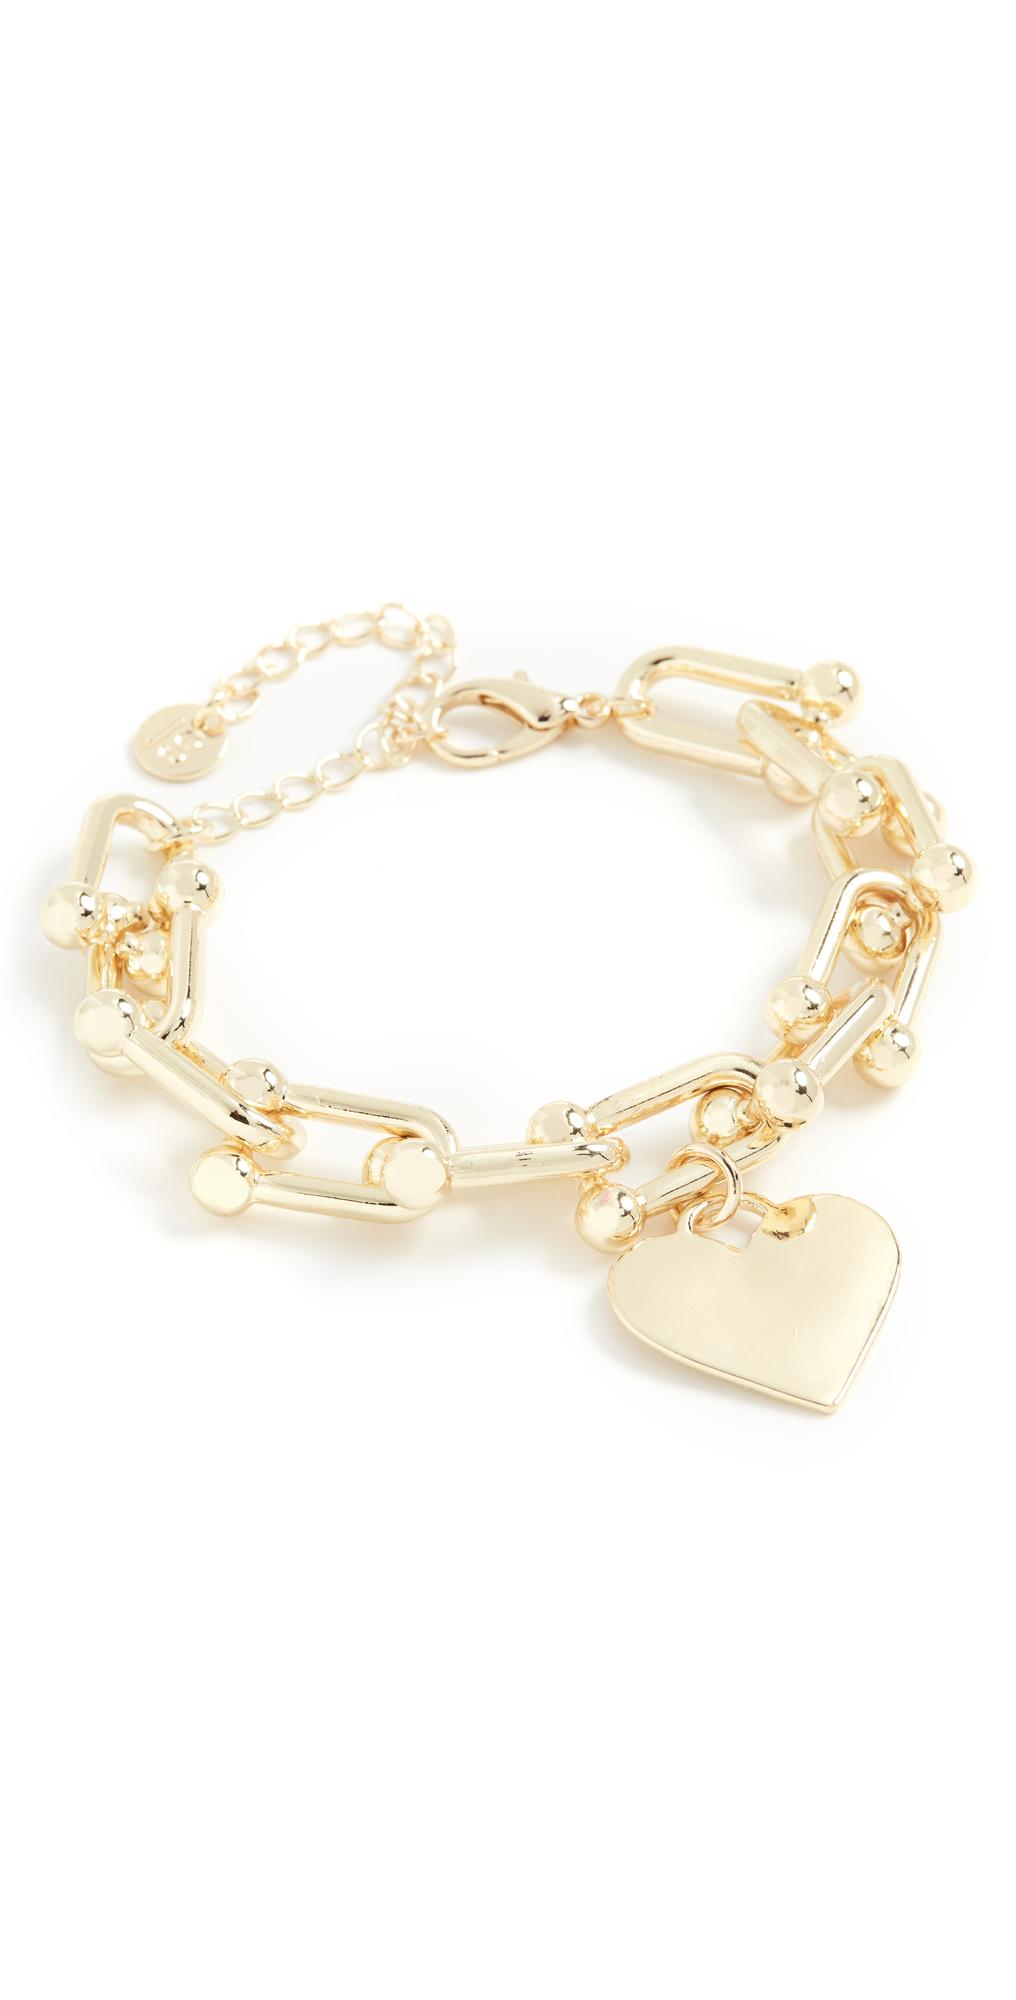 U Chain Link Heart Charm Bracelet